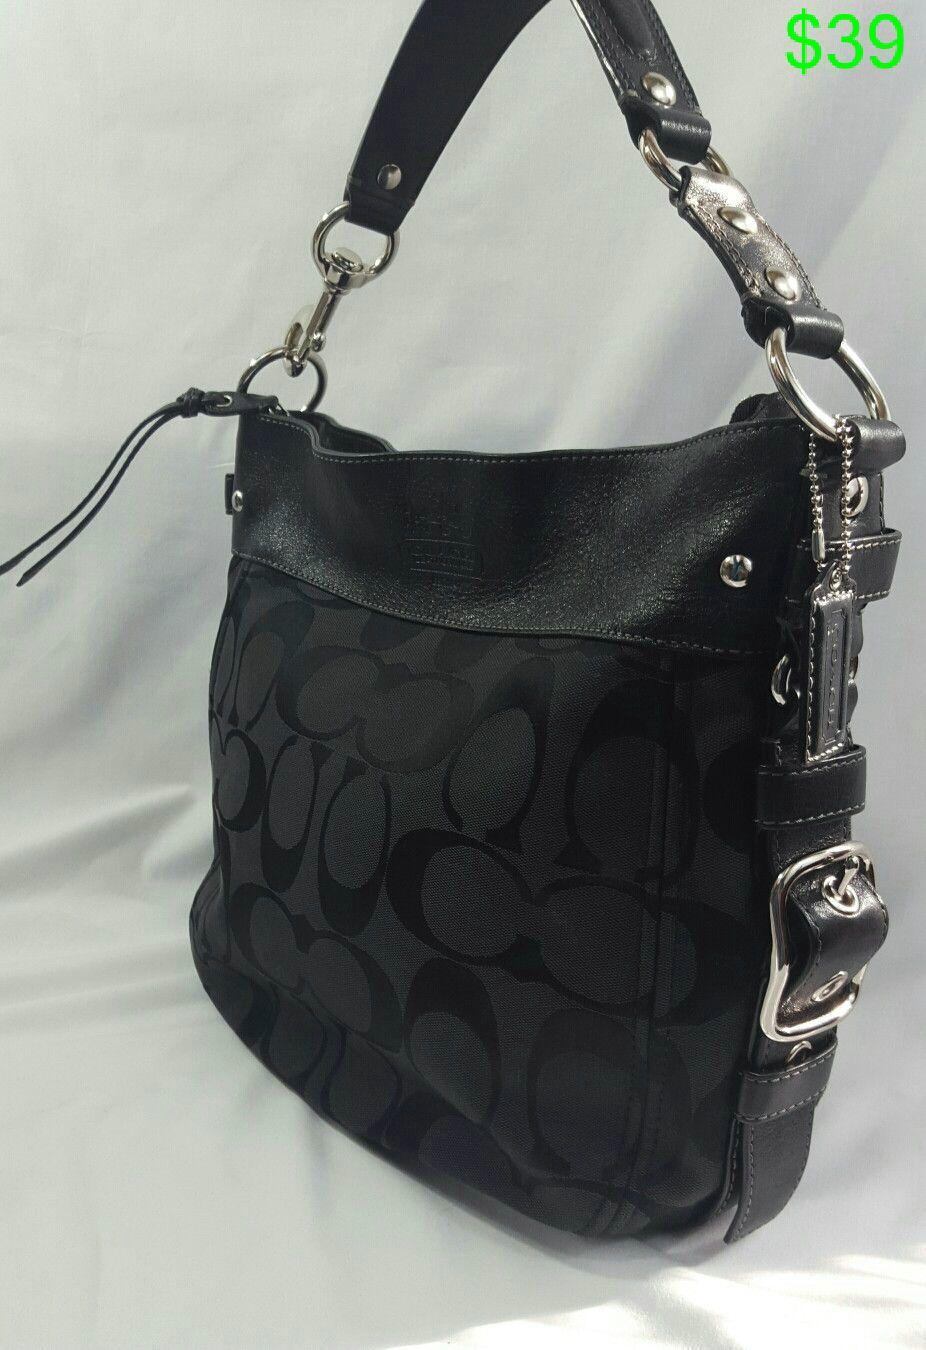 deed601bae07 Coach Black Signature Hobo Shoulder Bag